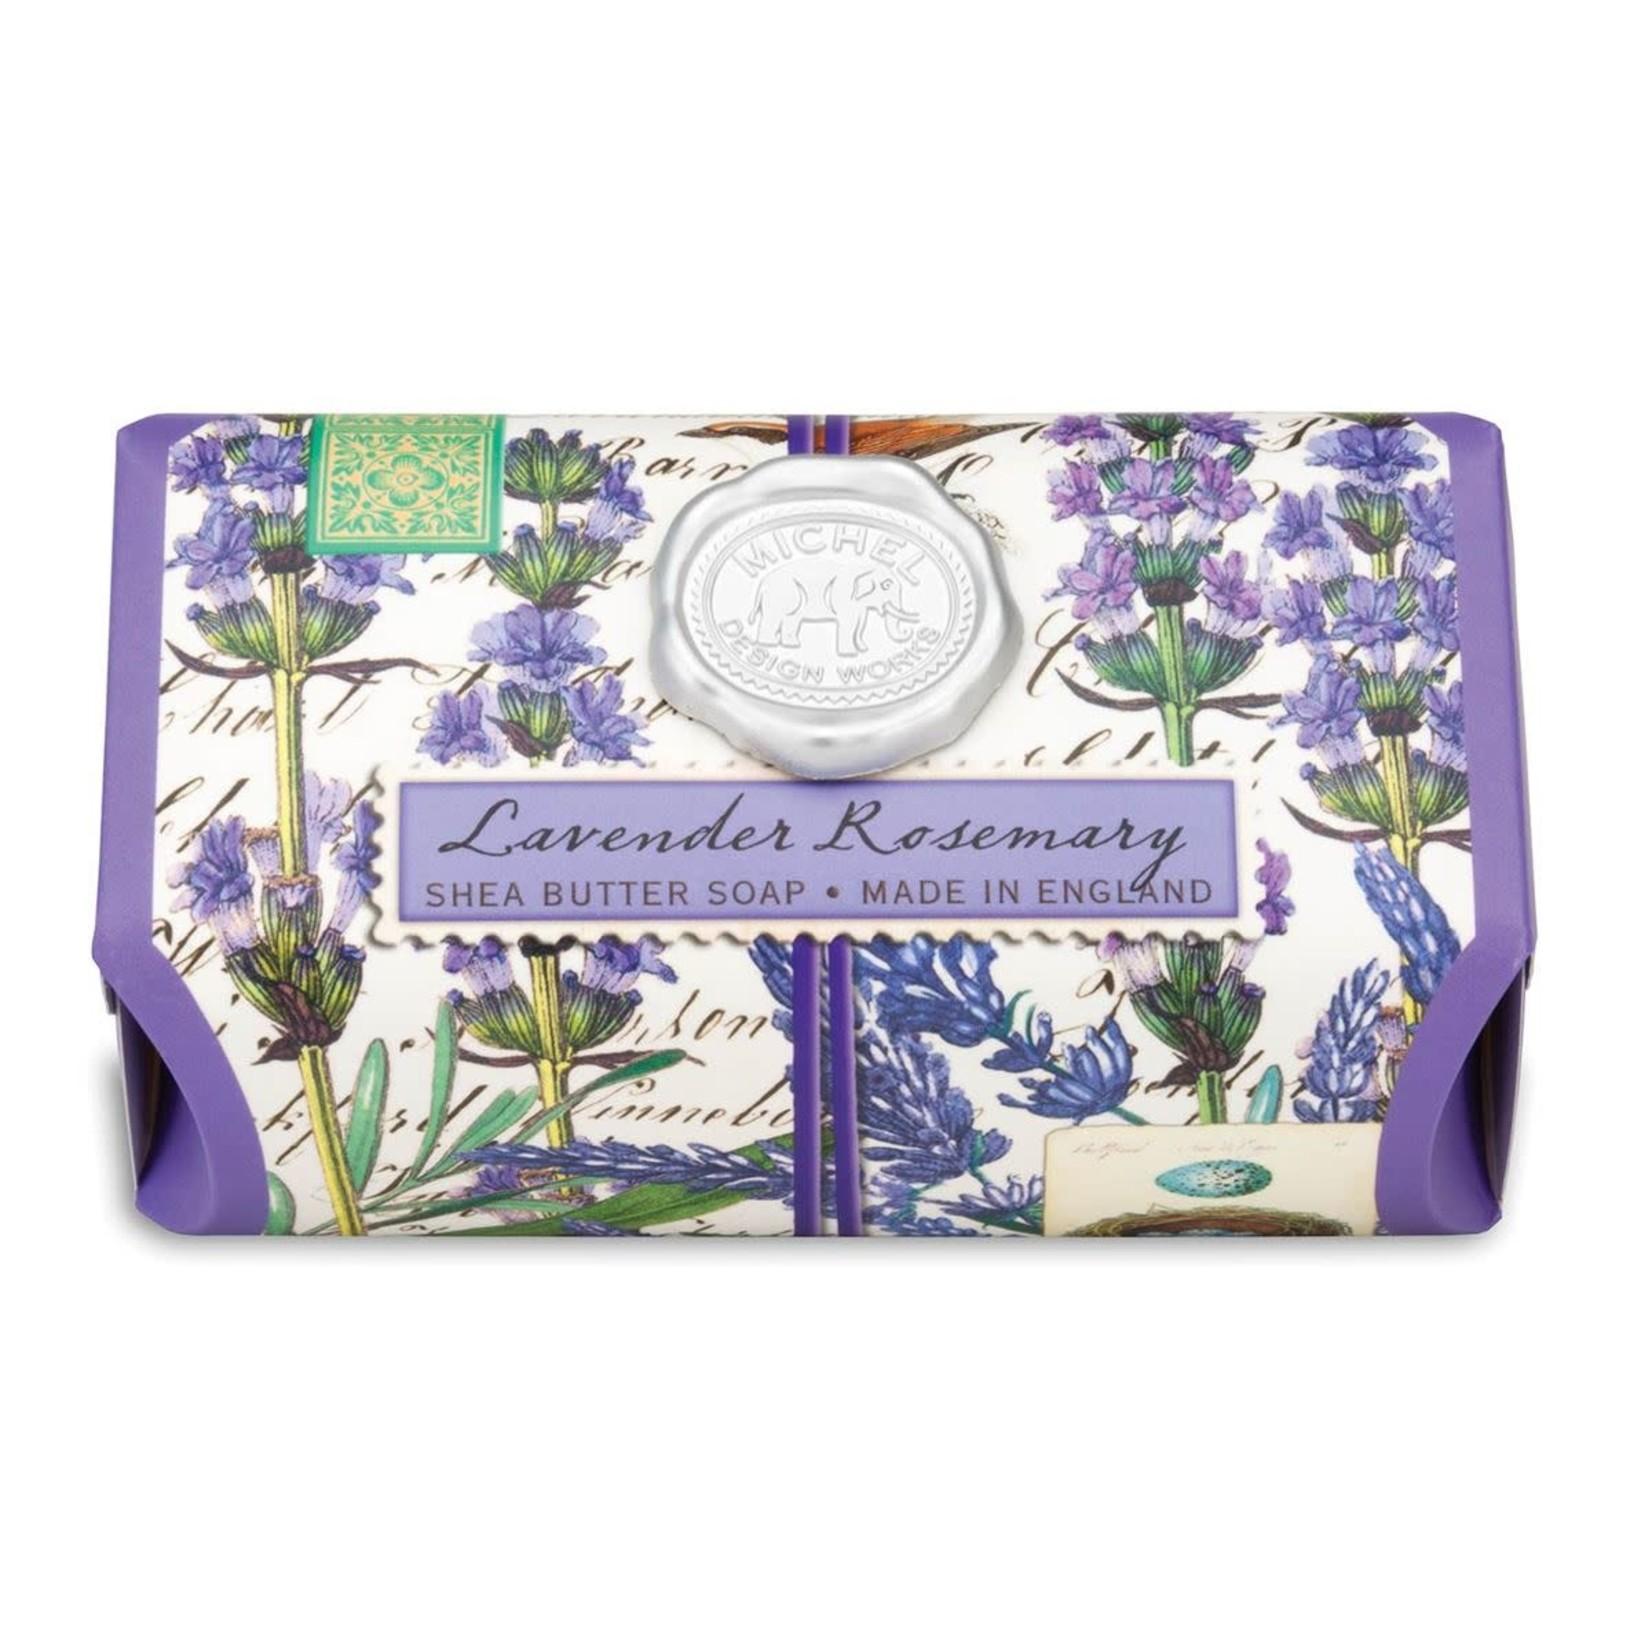 Michel Design Works Lavender Rosemary Large Bar Soap